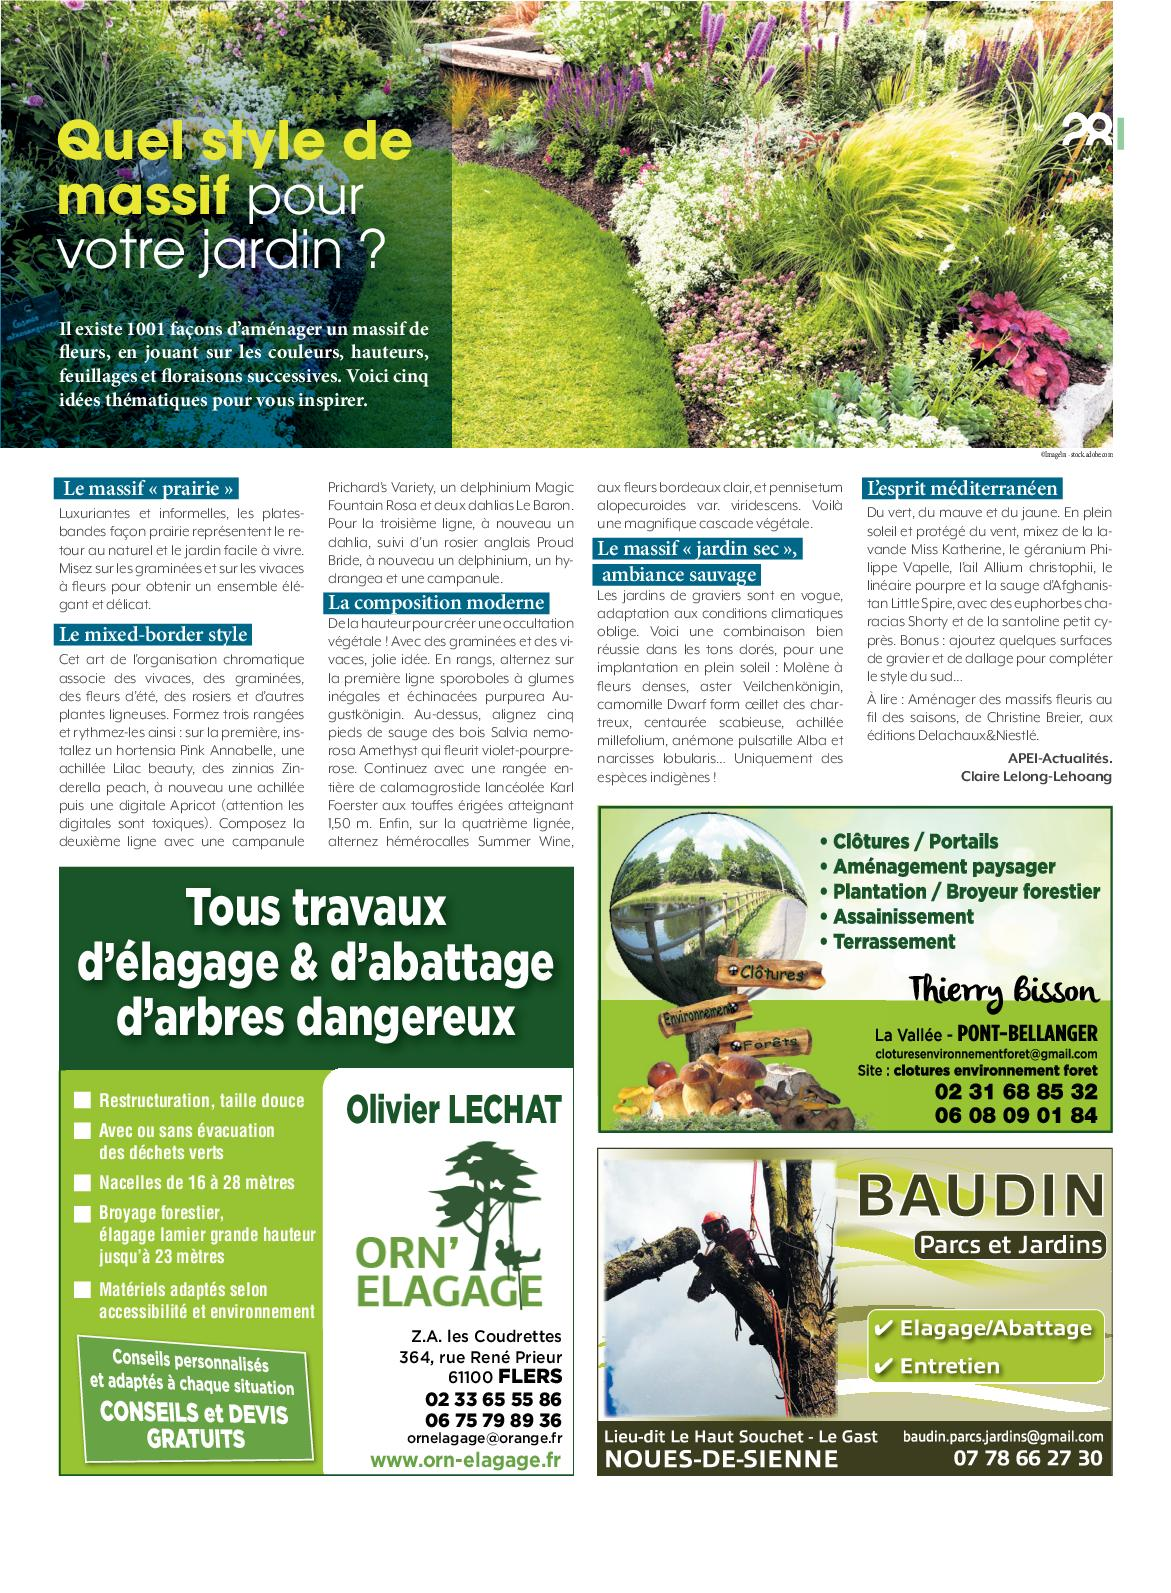 Idee Amenagement Jardin Luxe Habitat Oc Mars 2019 Calameo Downloader Of 57 Frais Idee Amenagement Jardin